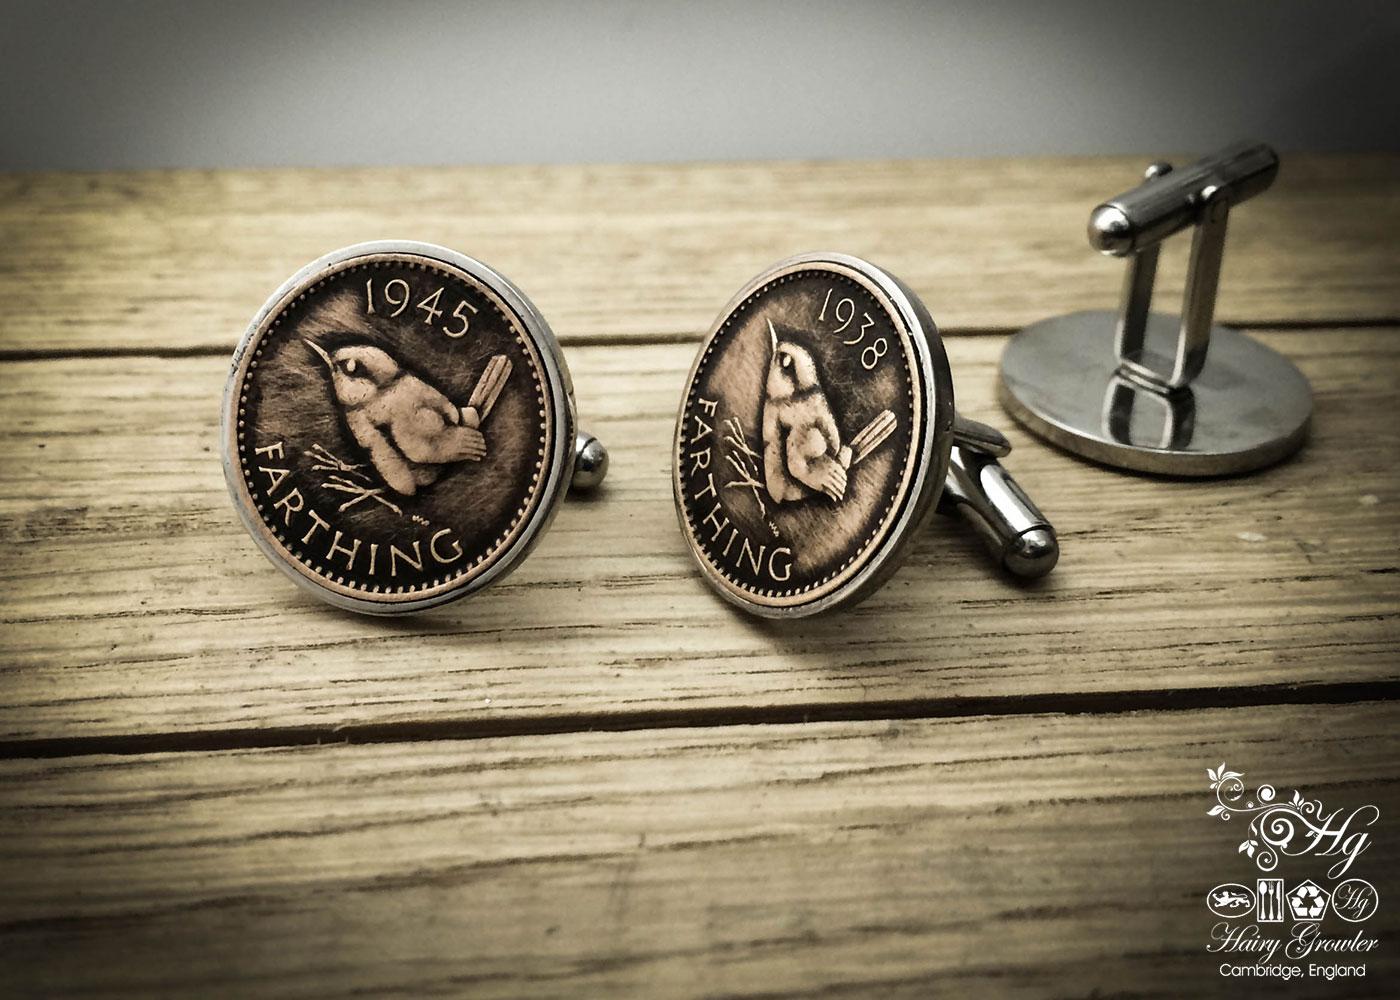 Jenny Wren Farthing coin cufflinks handmade in the Hg workshop